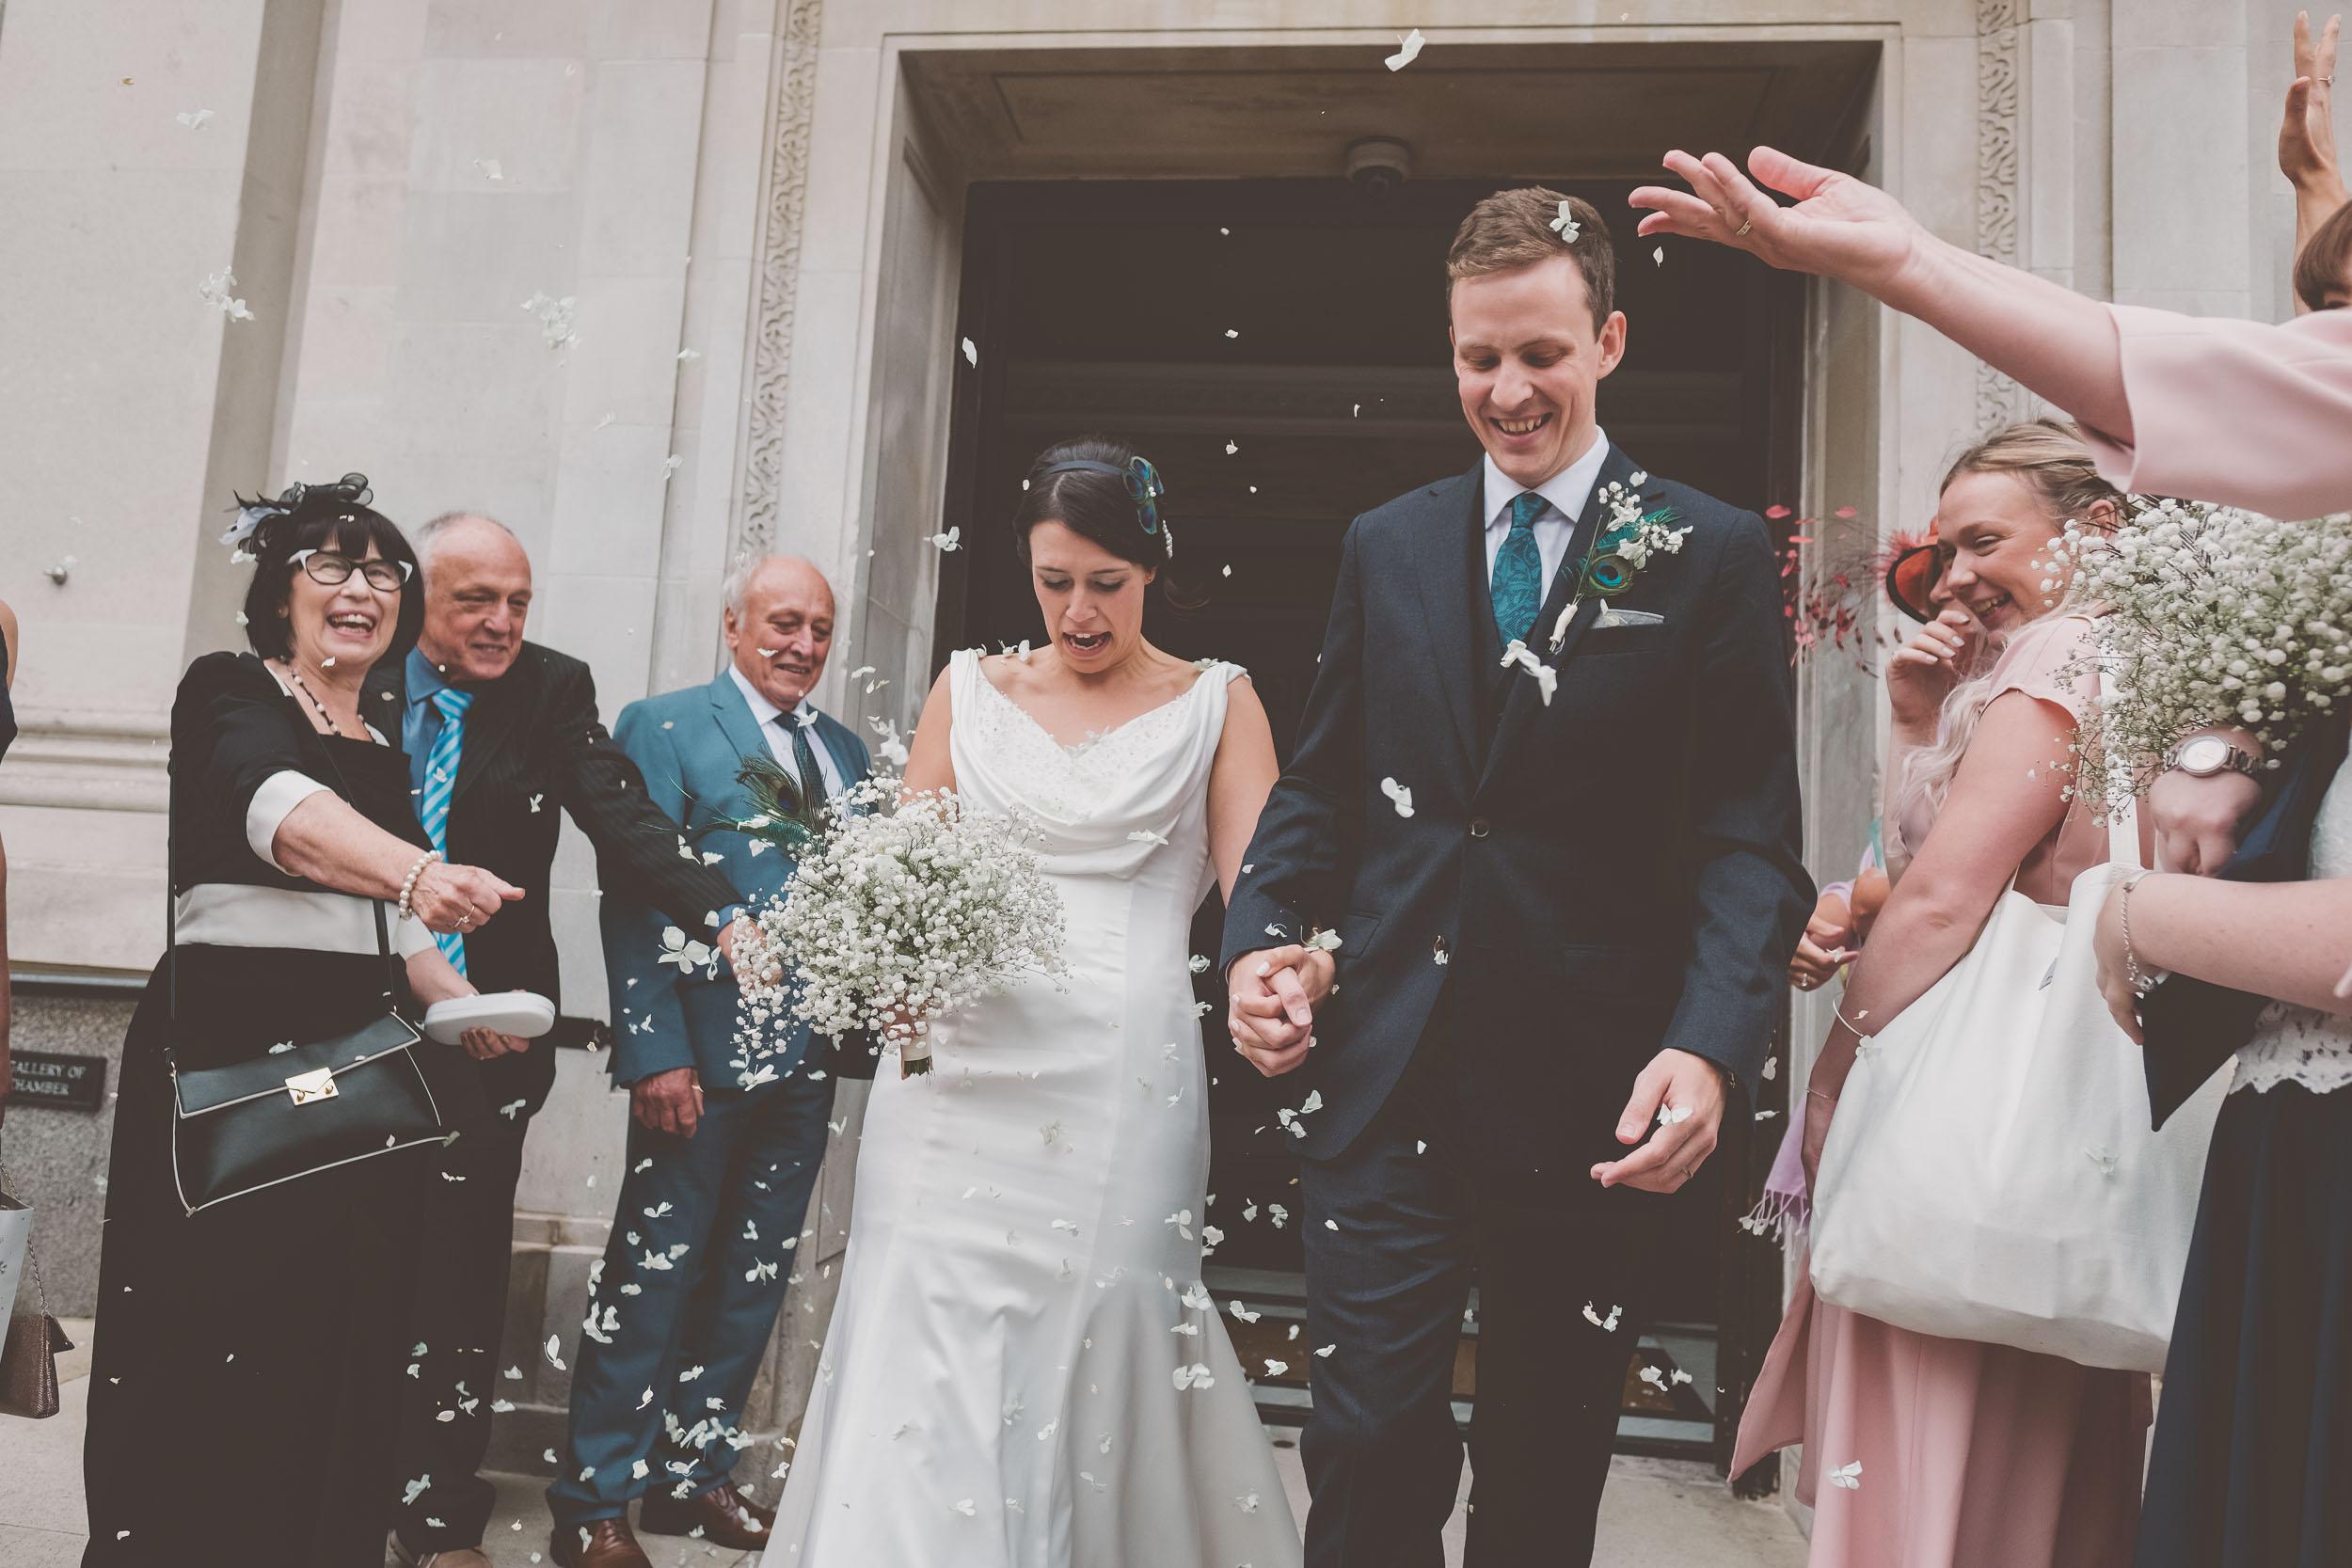 islington-town-hall-4th-floor-studios-wedding147.jpg